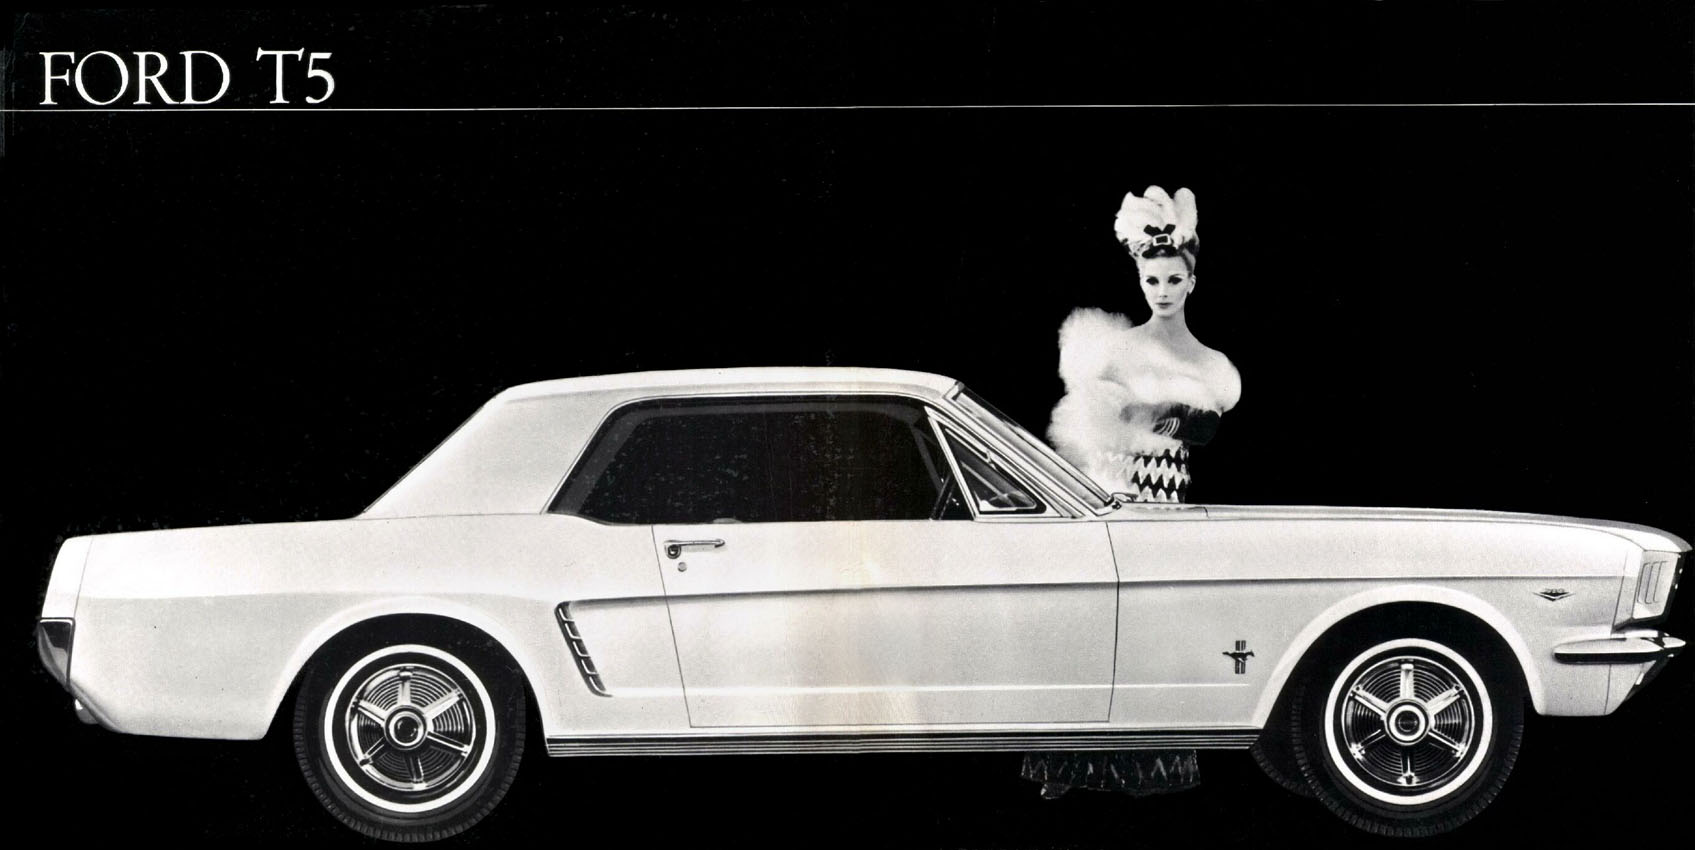 1965 Ford T5 Prospekt Seite 3